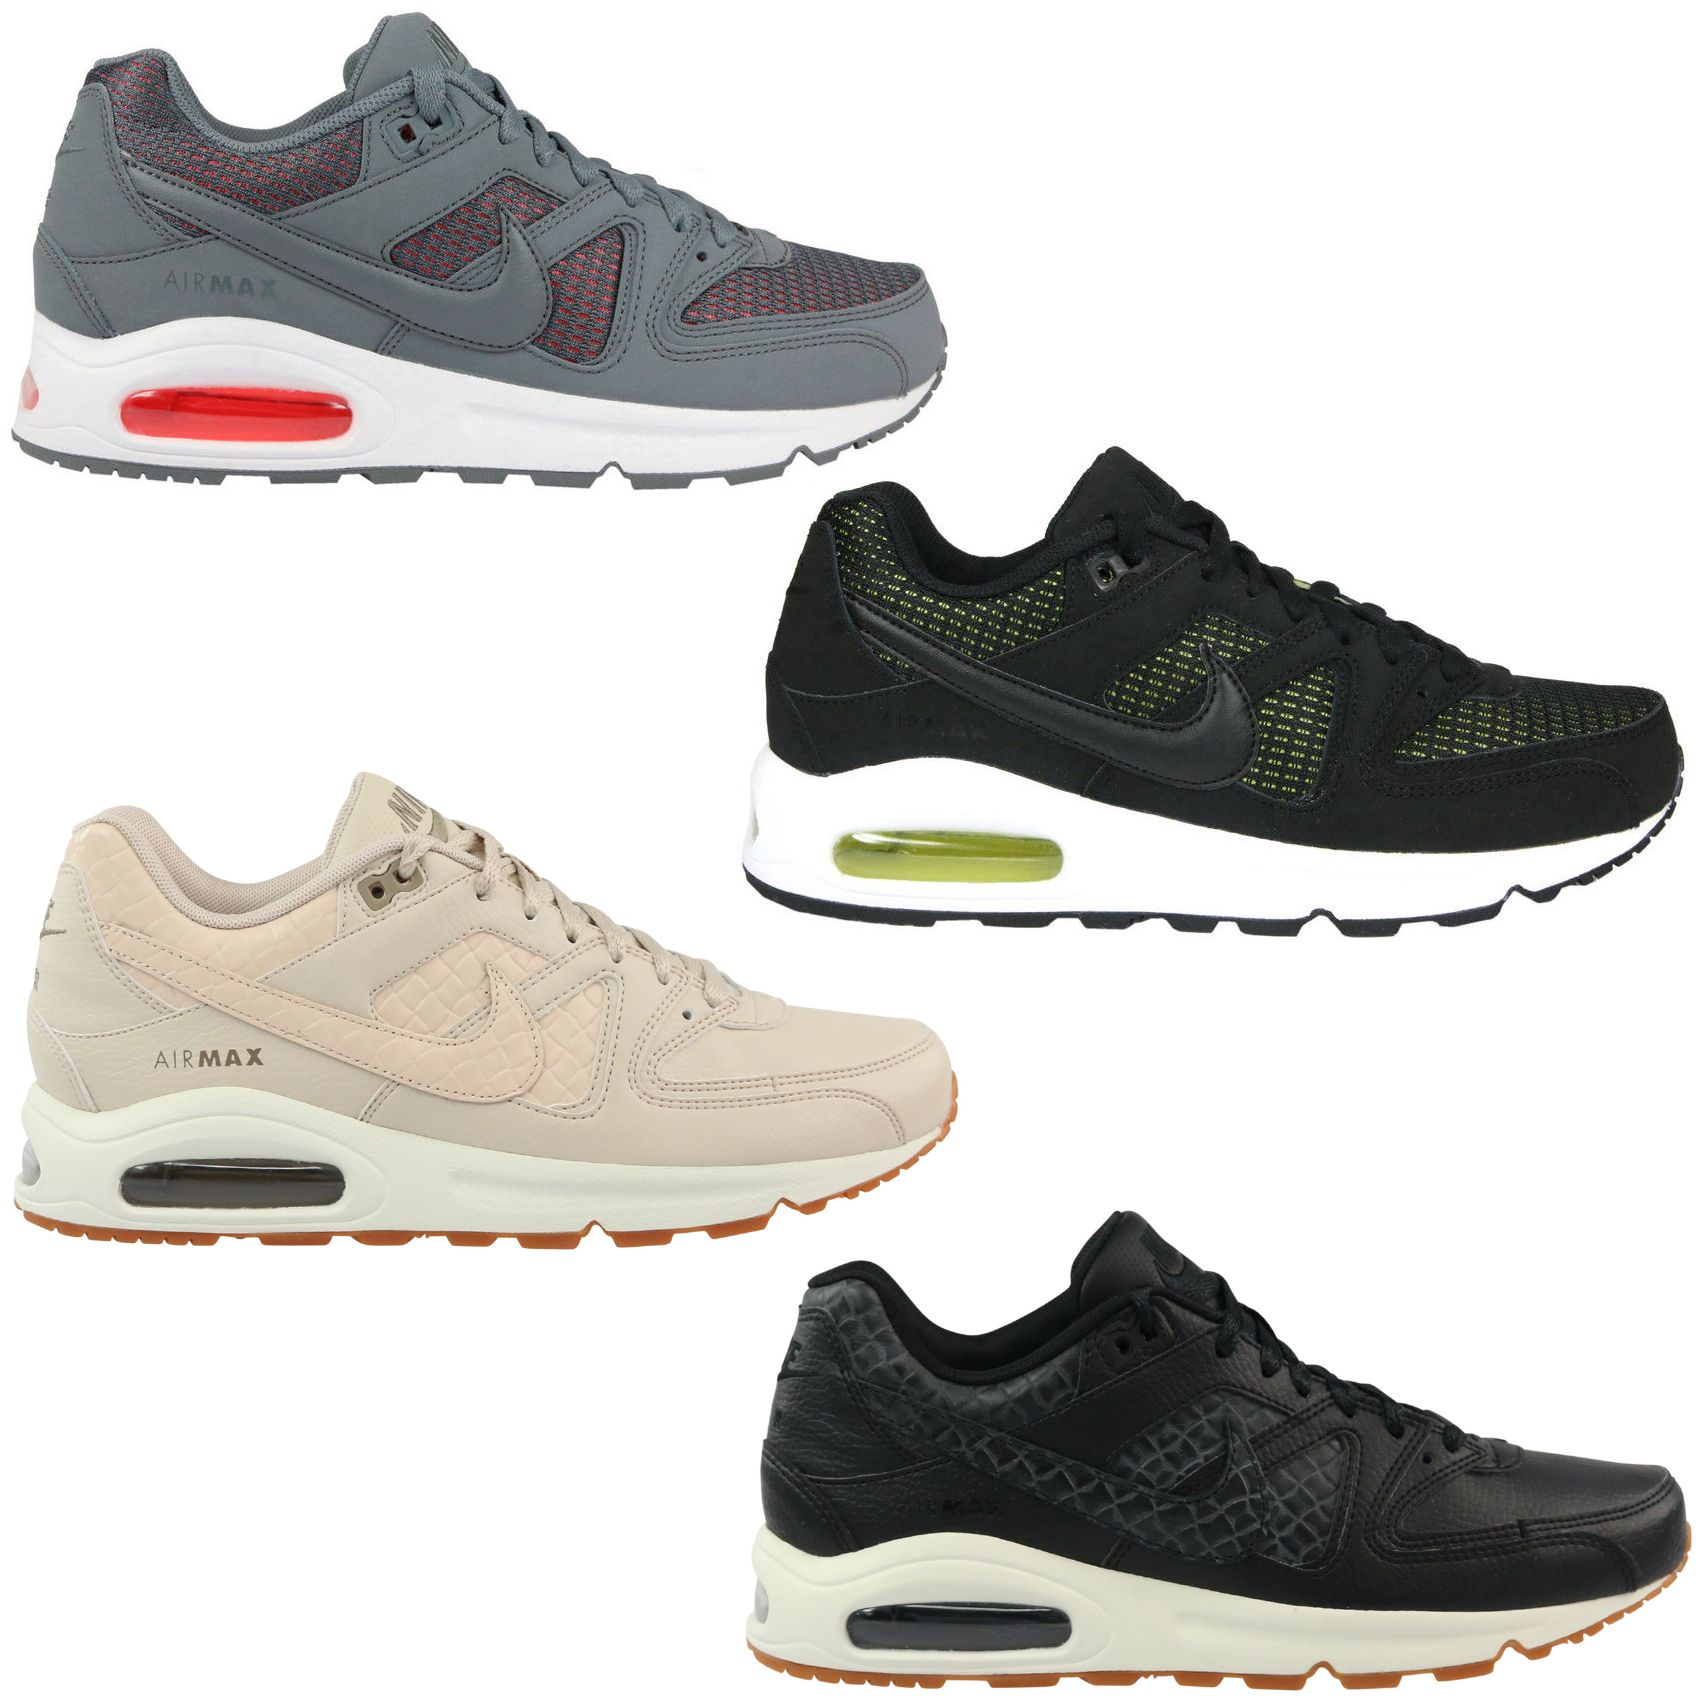 nike wmns air max command schuhe sneaker turnschuhe damen. Black Bedroom Furniture Sets. Home Design Ideas